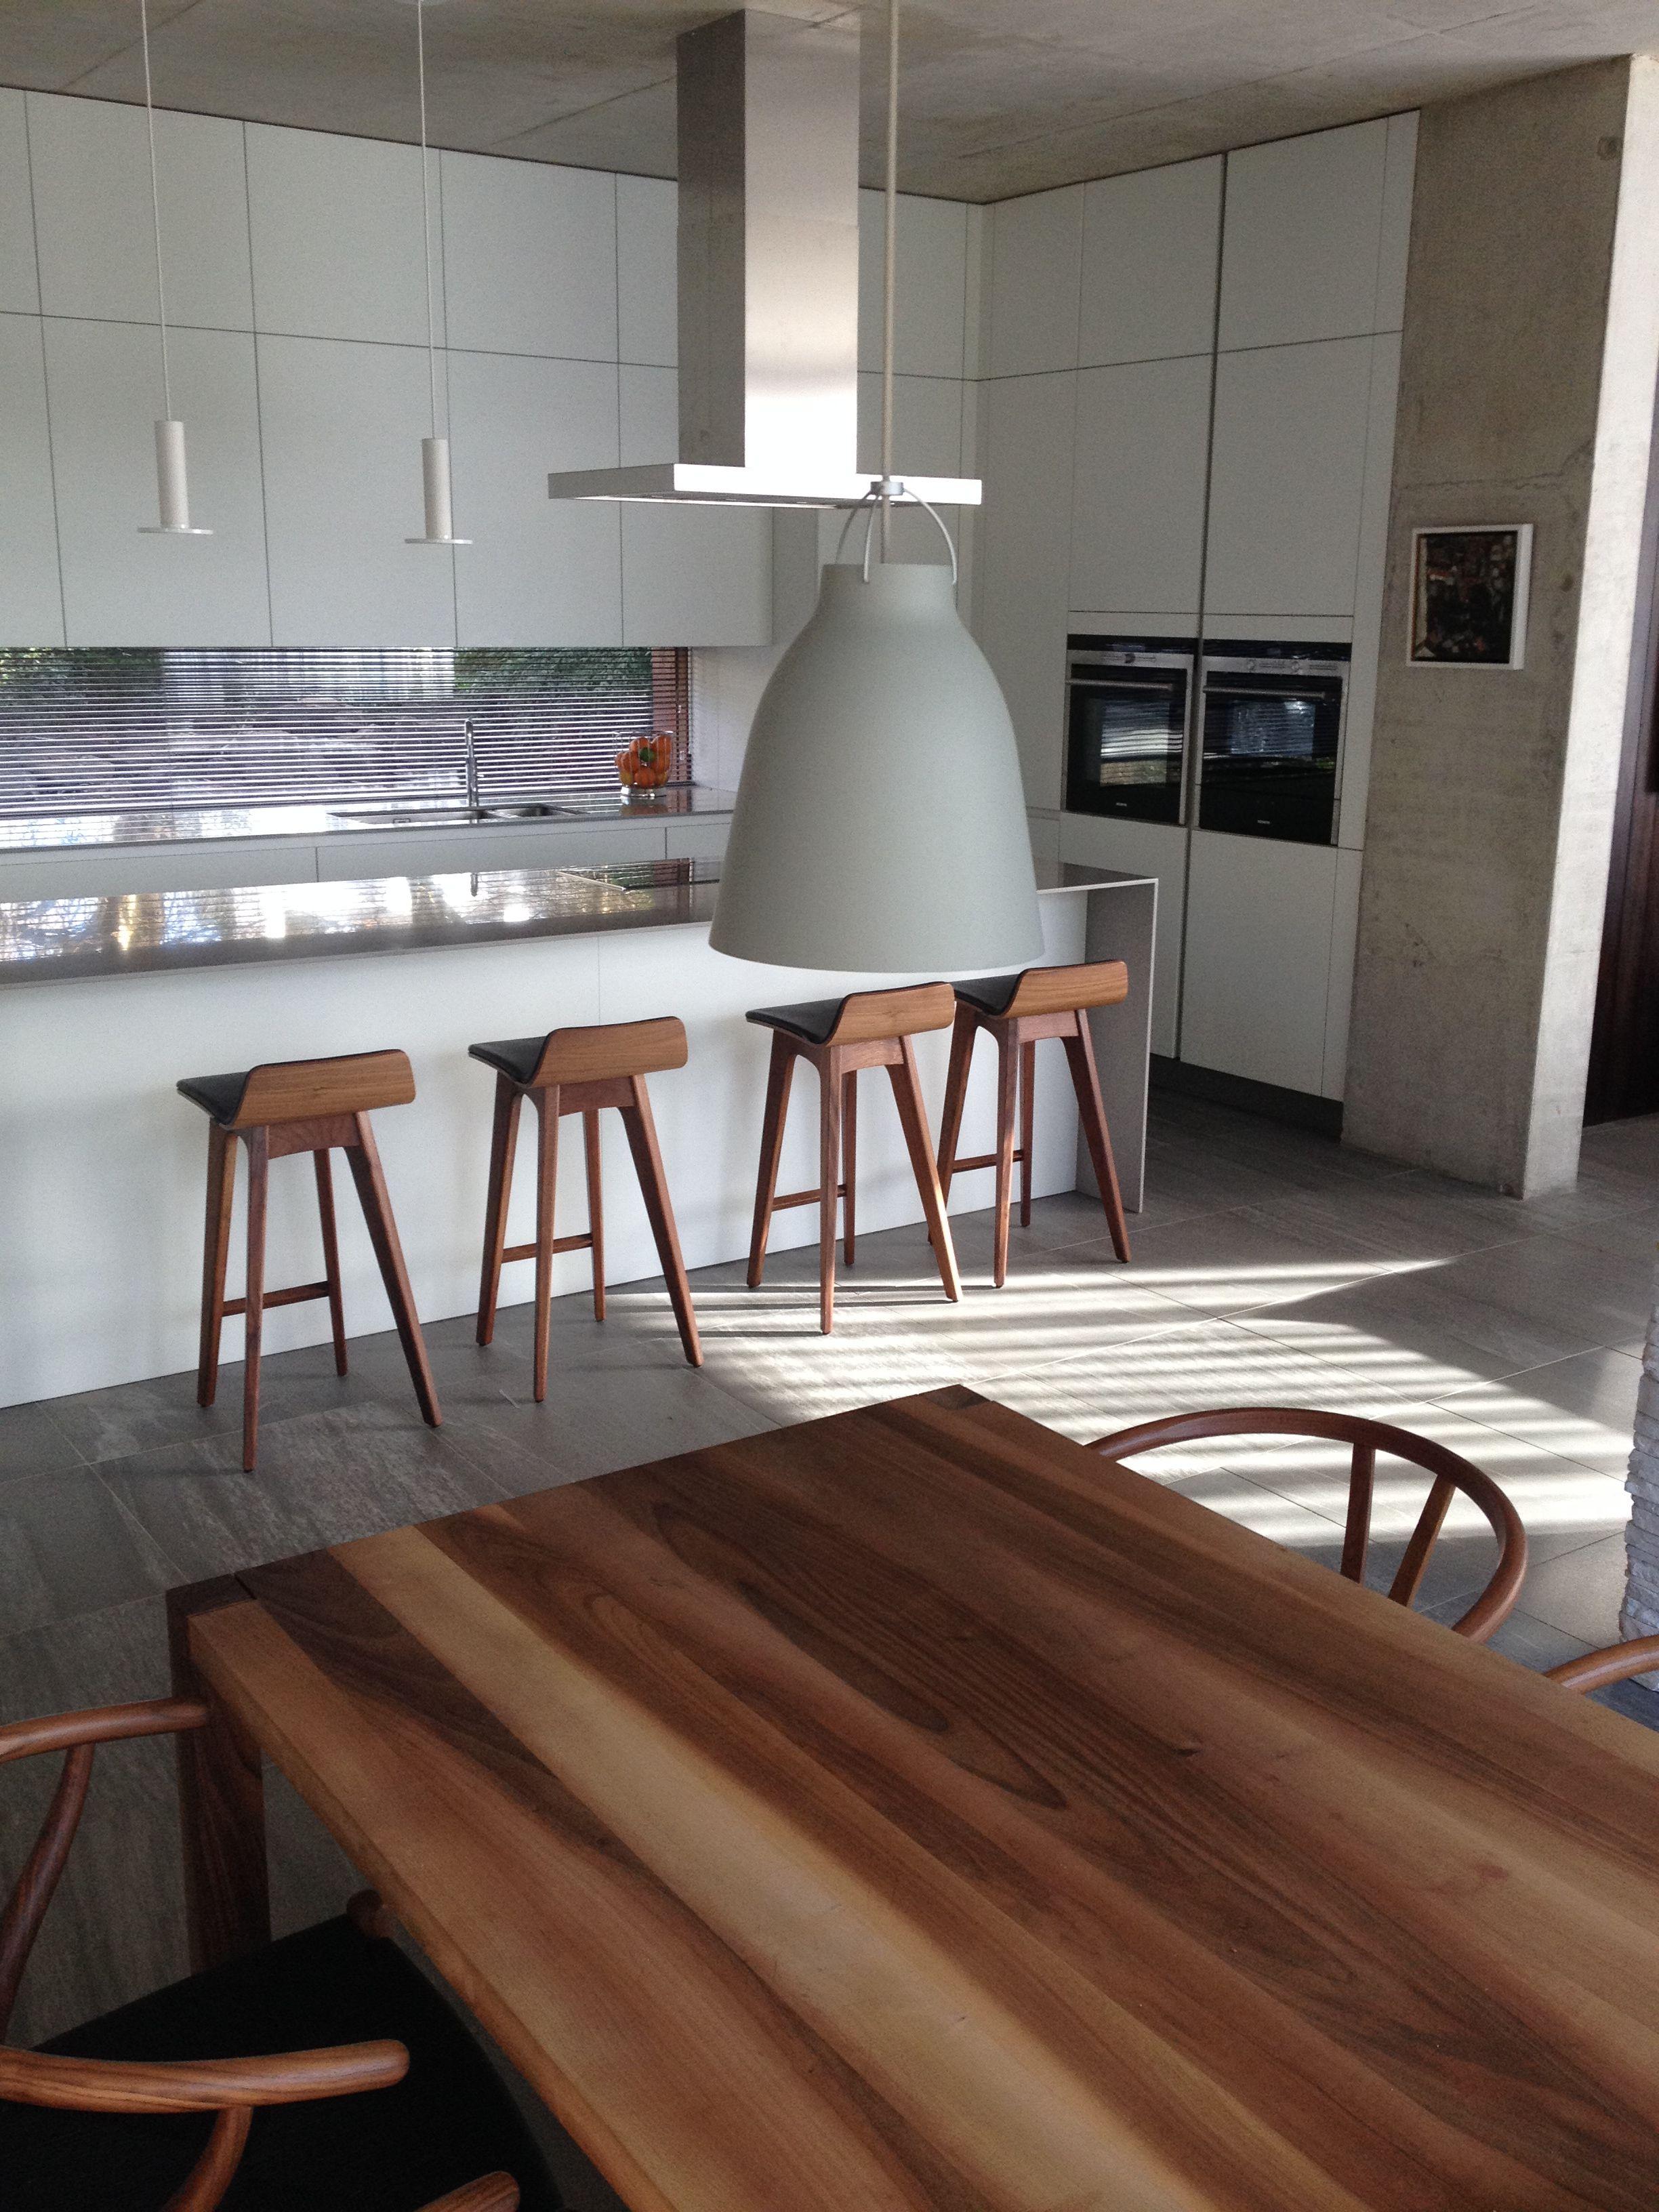 Dining Amp Kitchen Area Lightyears Caravaiggio Pendant